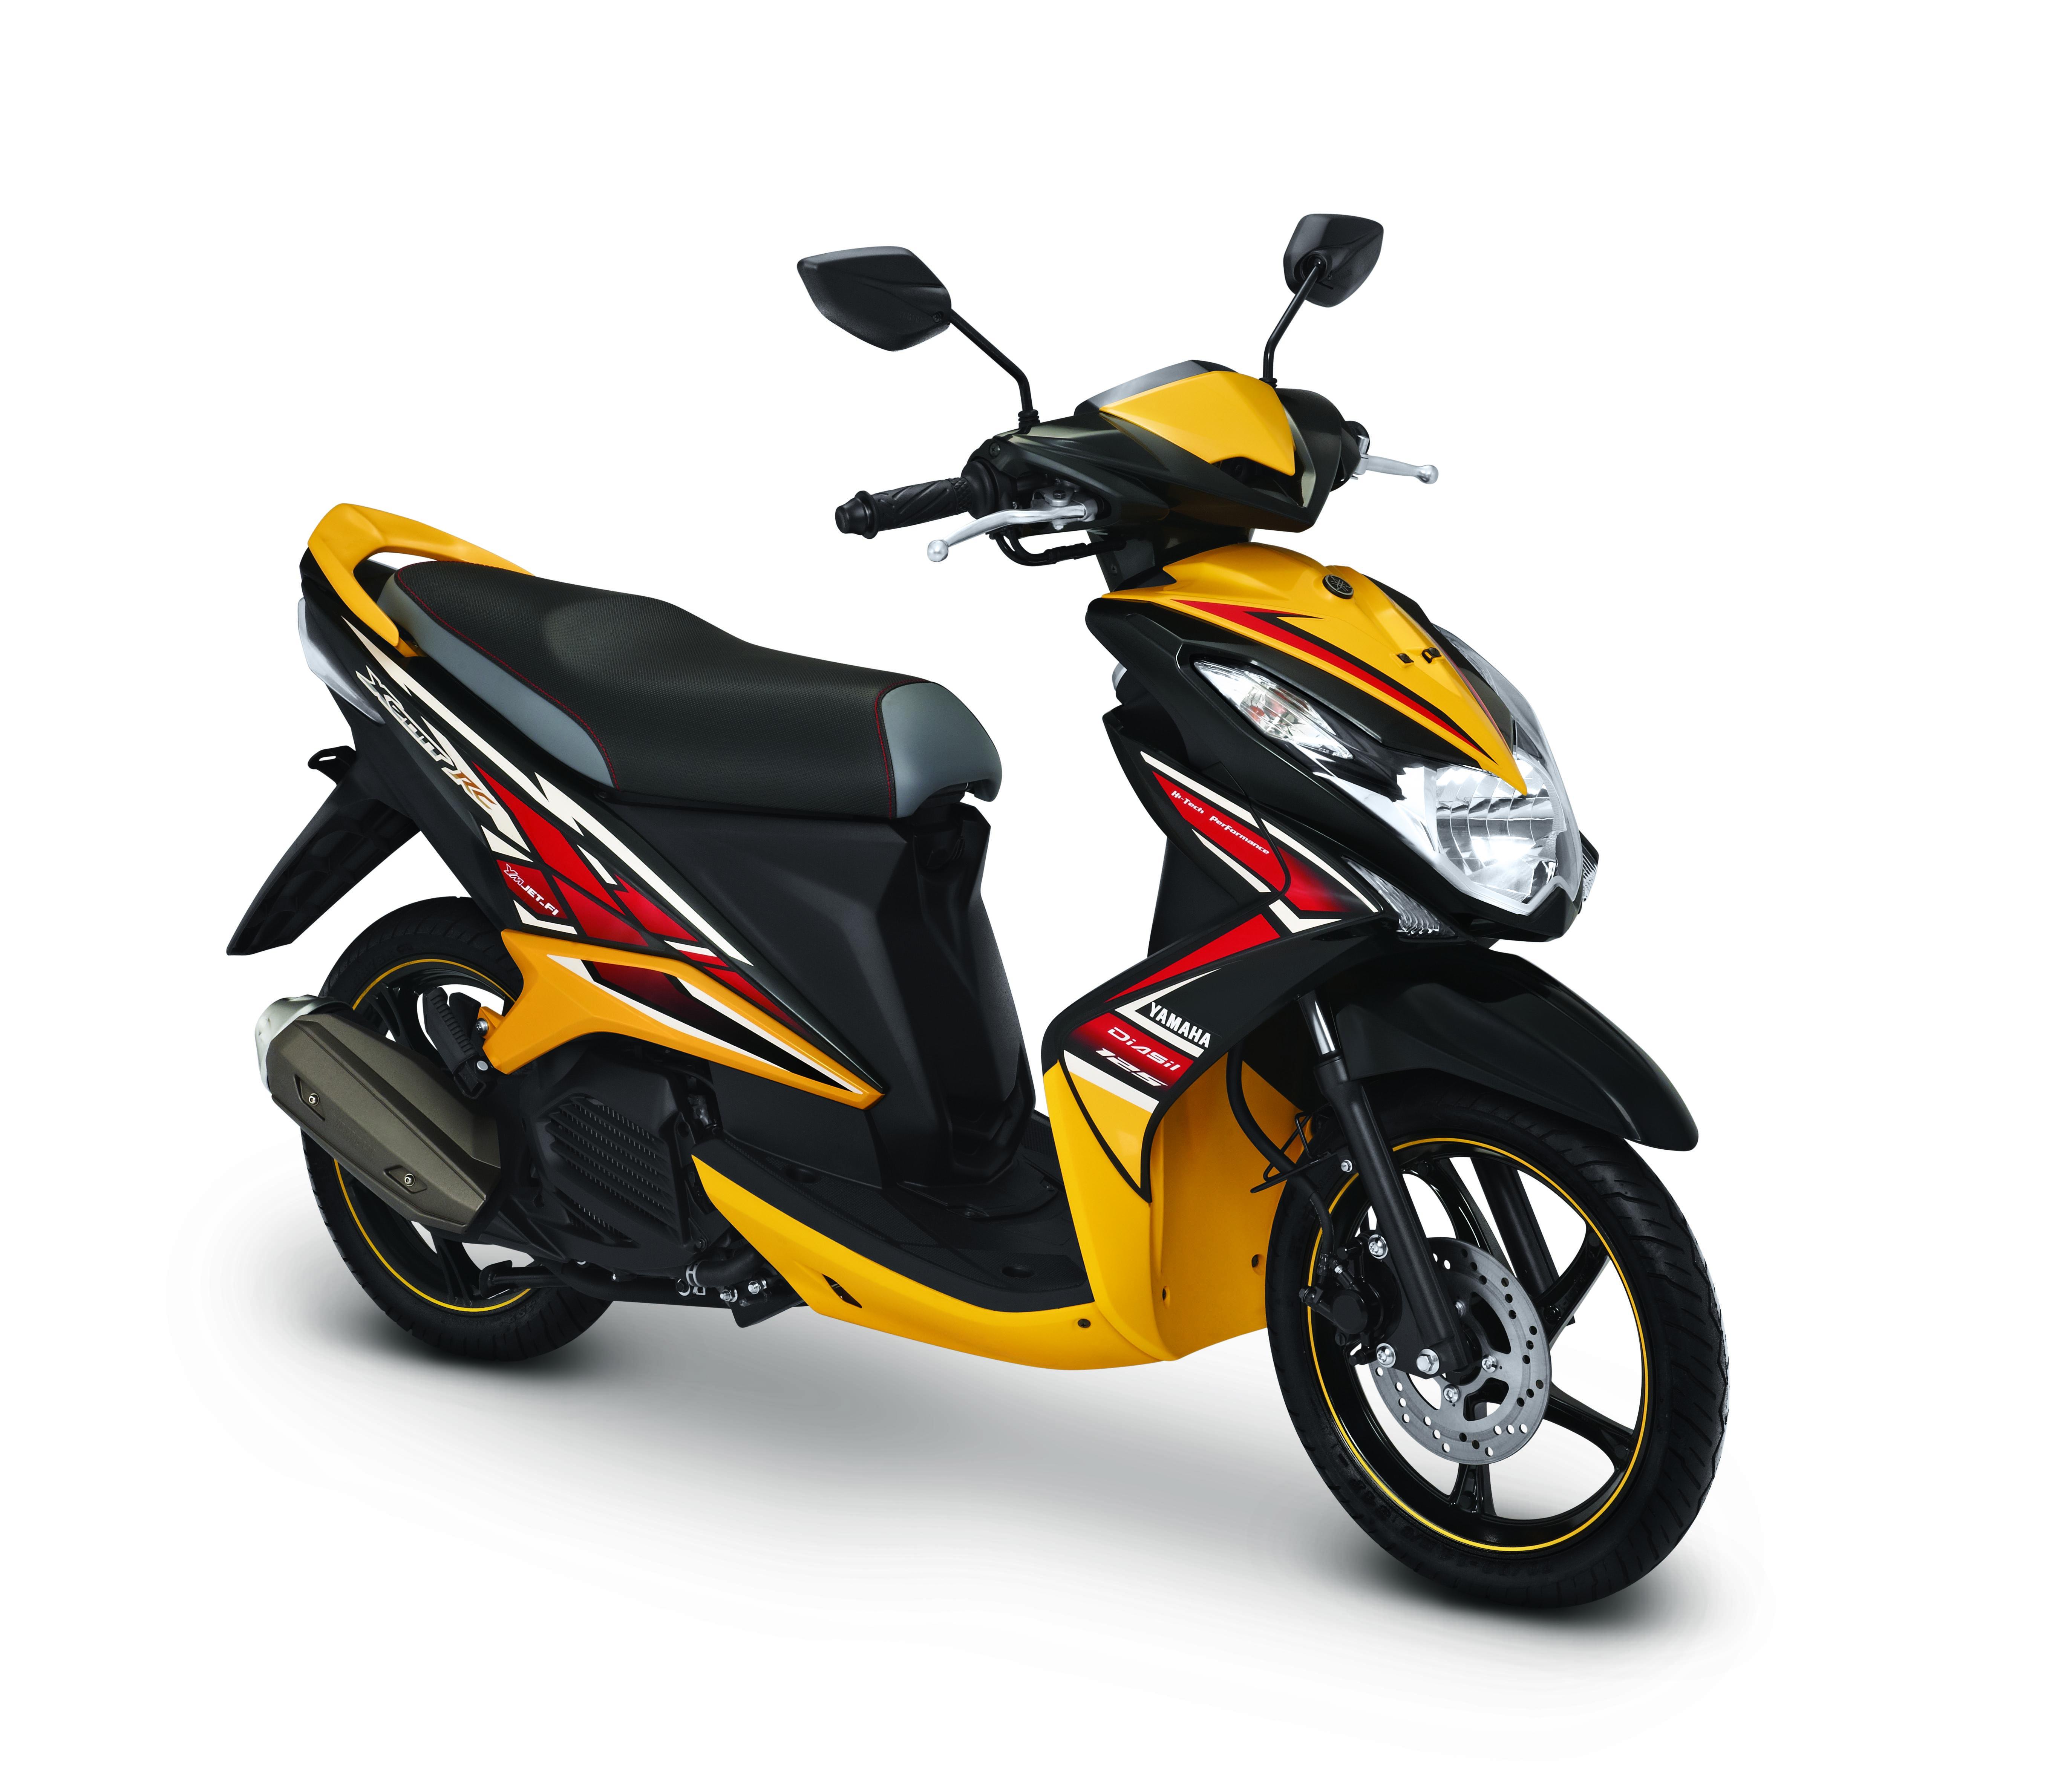 Xeon RC, Harusnya Bisa Ngelawan Vario Techno!!! 8 Februari, 2013